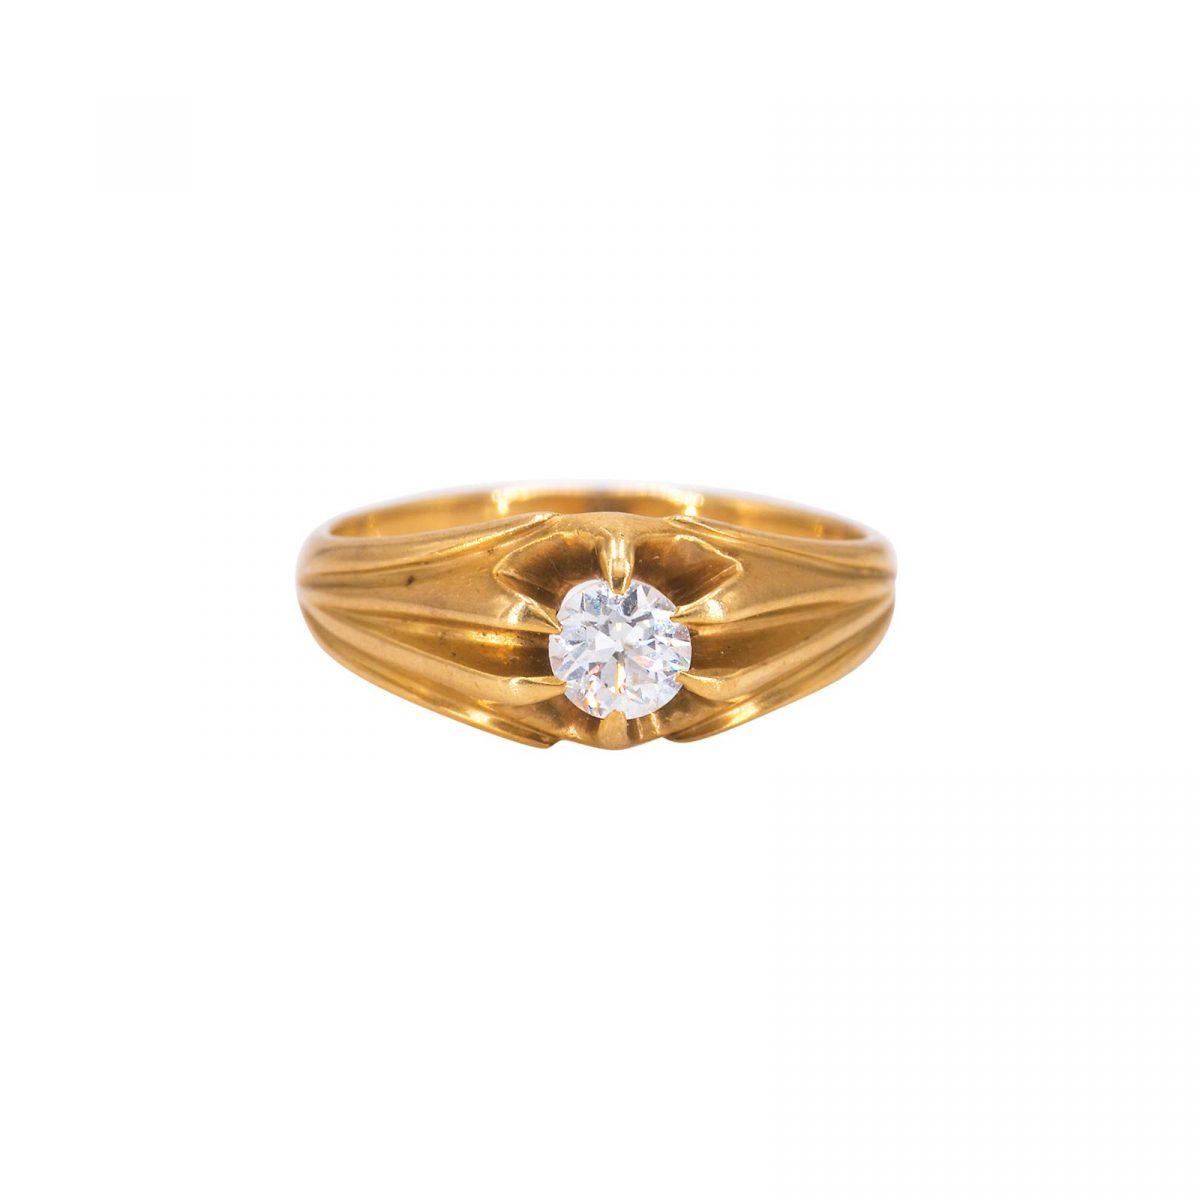 Chloe 14 carat yellow gold diamond ring